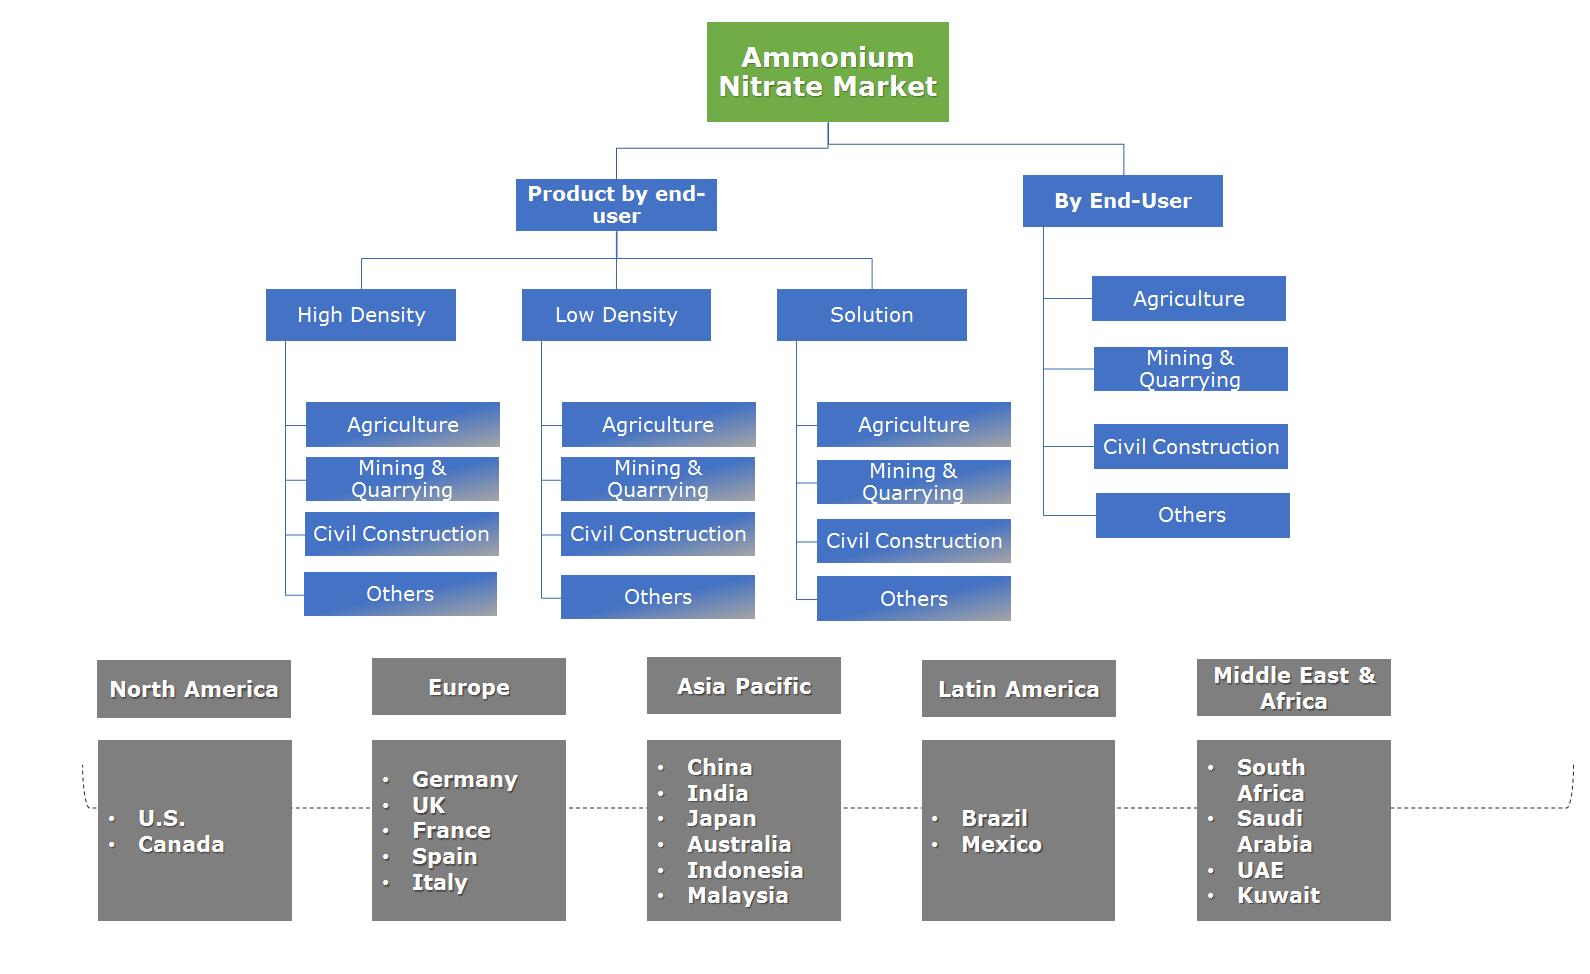 Ammonium Nitrate Market